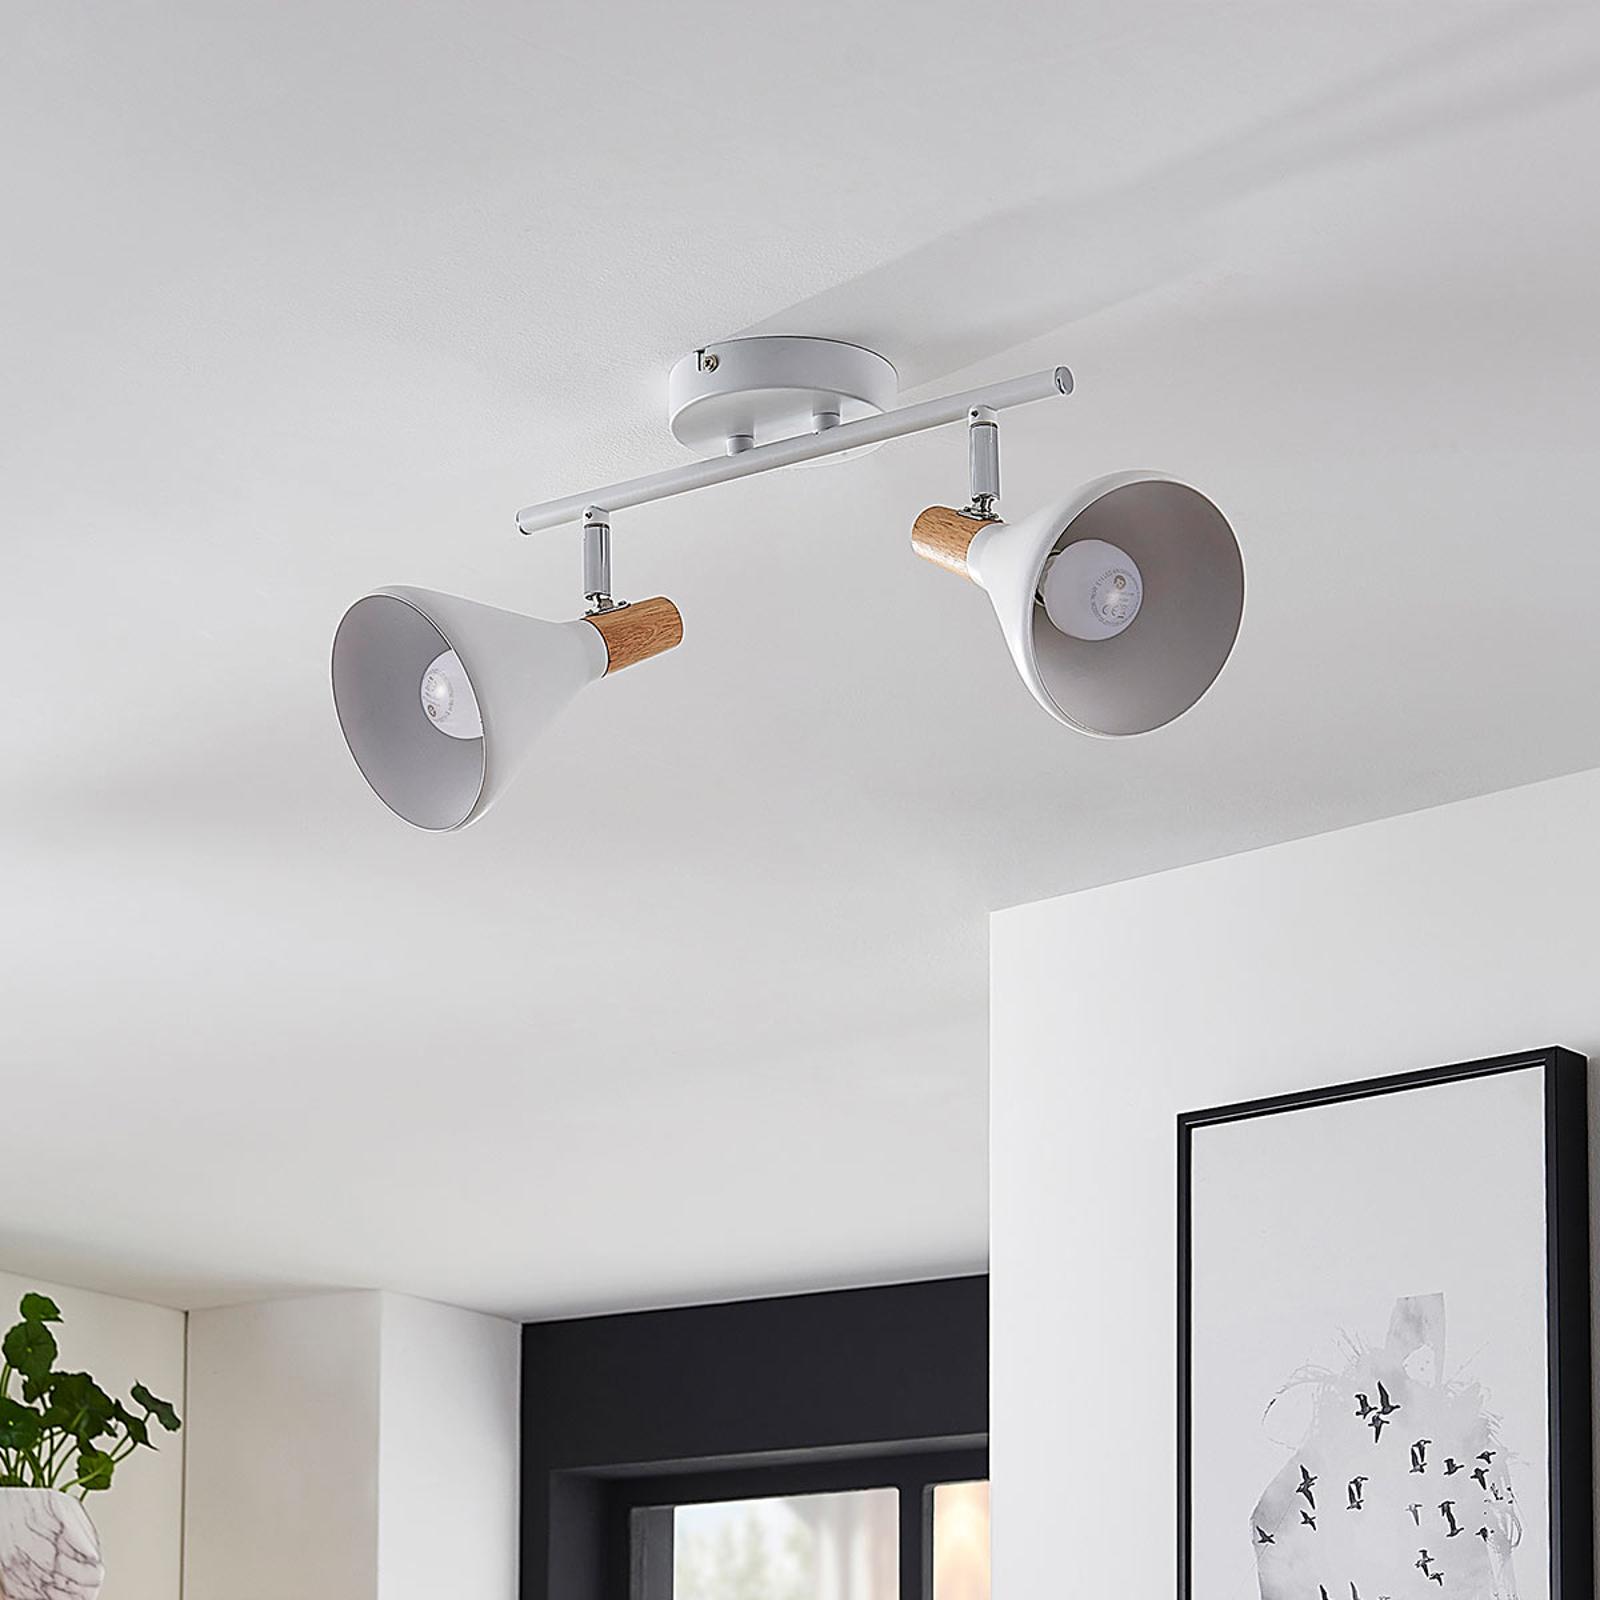 Plafonnier LED Arina à 2 lampes